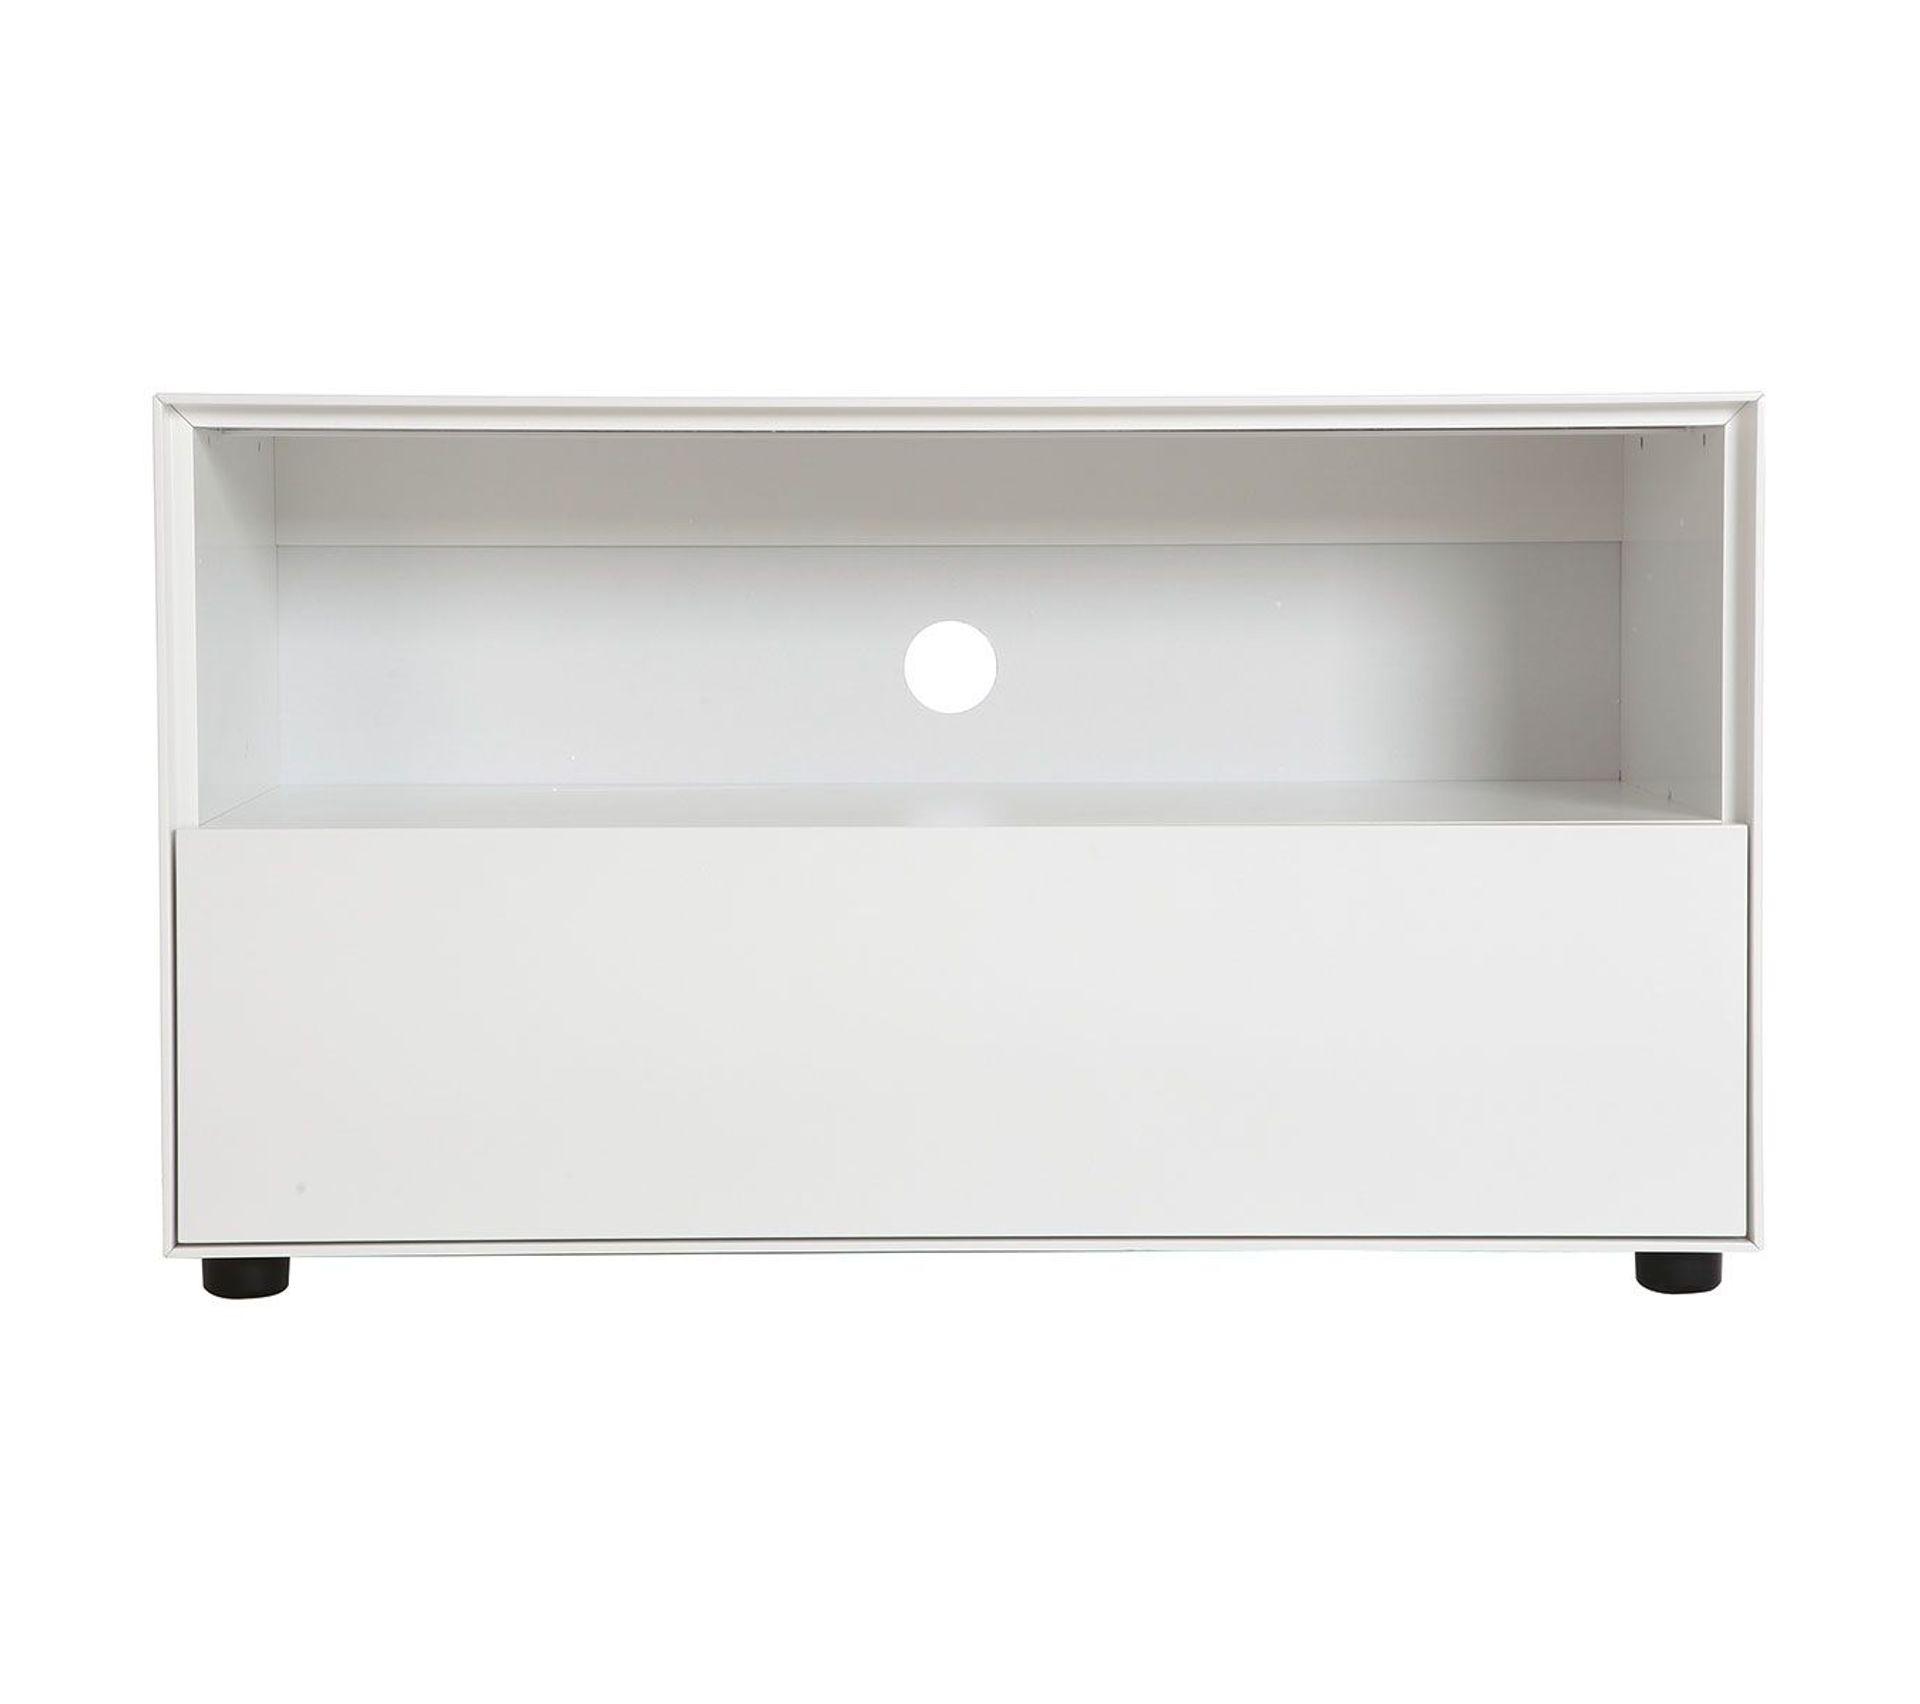 Hauteur Meuble Tele meuble tv design 90 cm blanc mat 1 tiroir mark